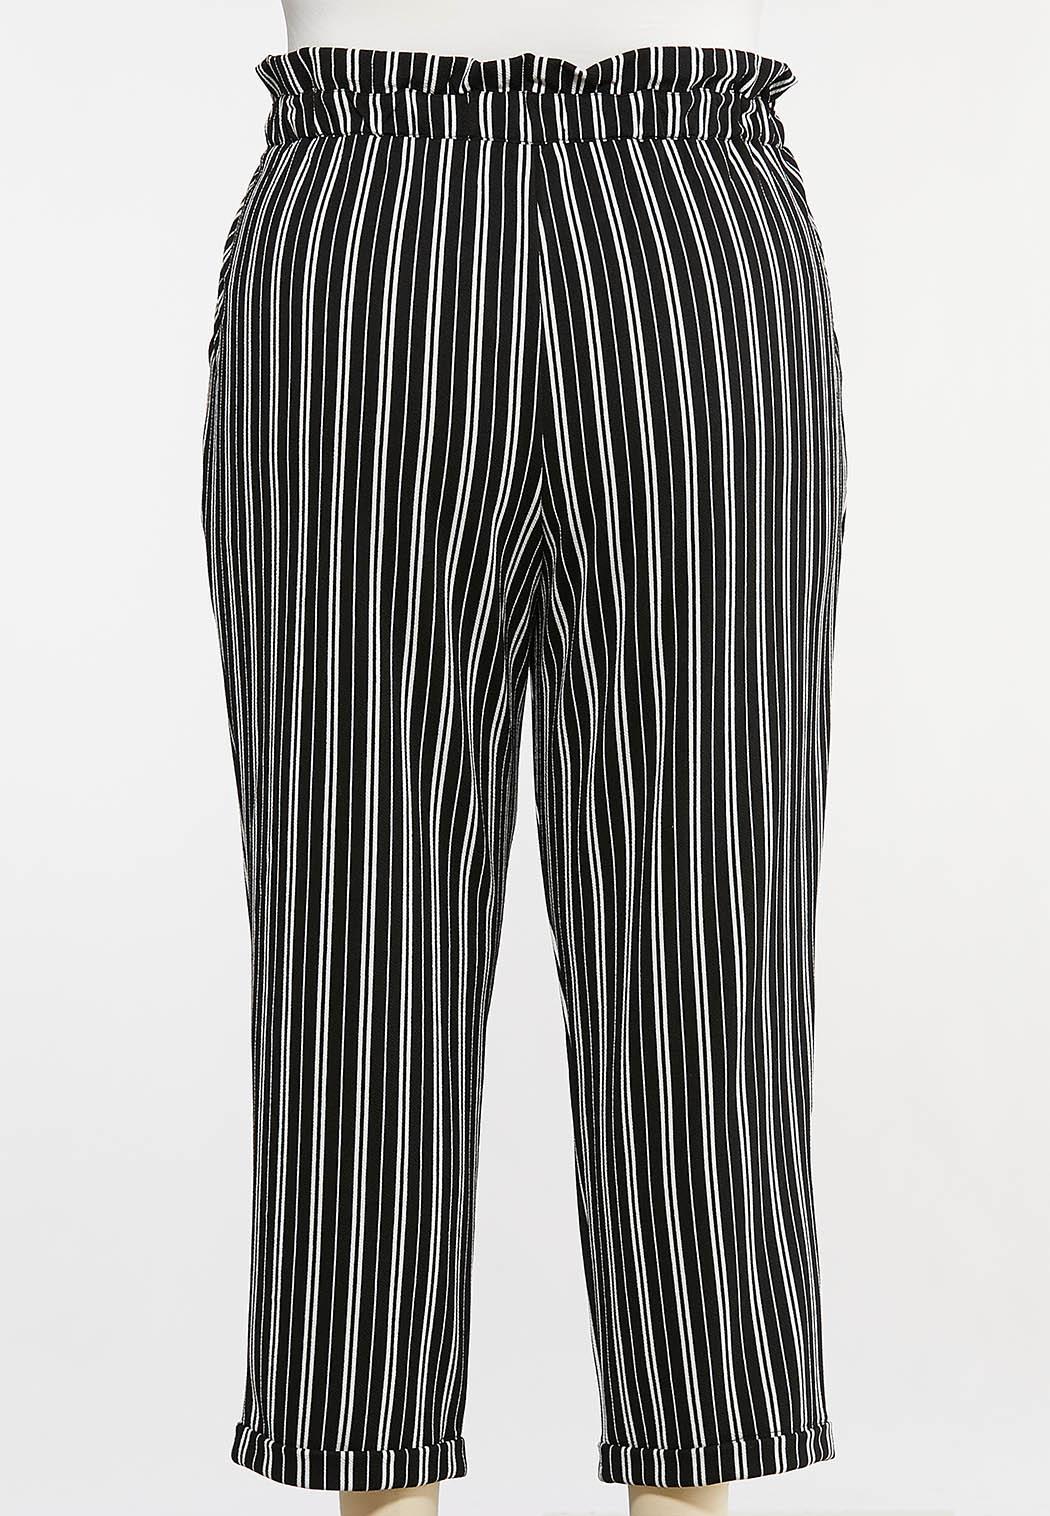 Plus Size Black And White Tie Pants (Item #44108256)